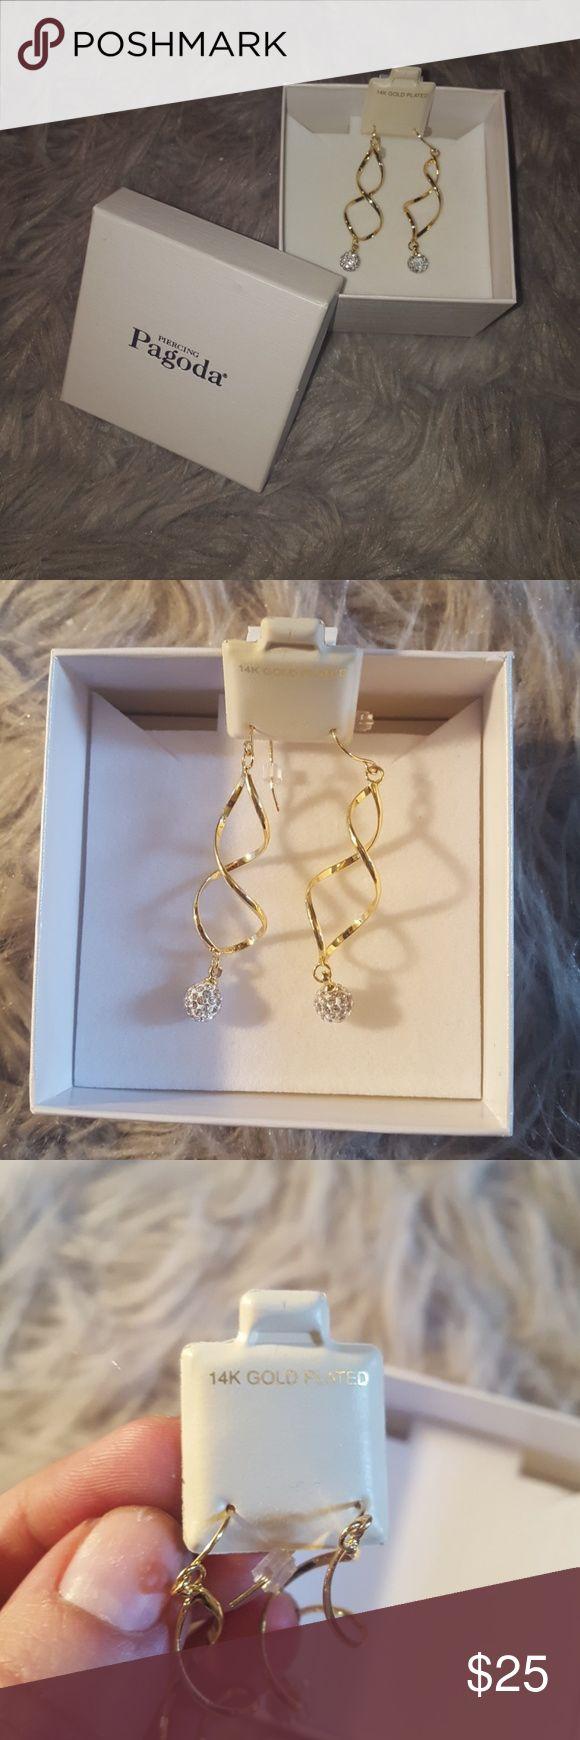 Dangling Earrings Piercing Pagoda 14k Gold Plated Earrings  Never worn Adorable crystal bottoms Piercing Pagoda Jewelry Earrings